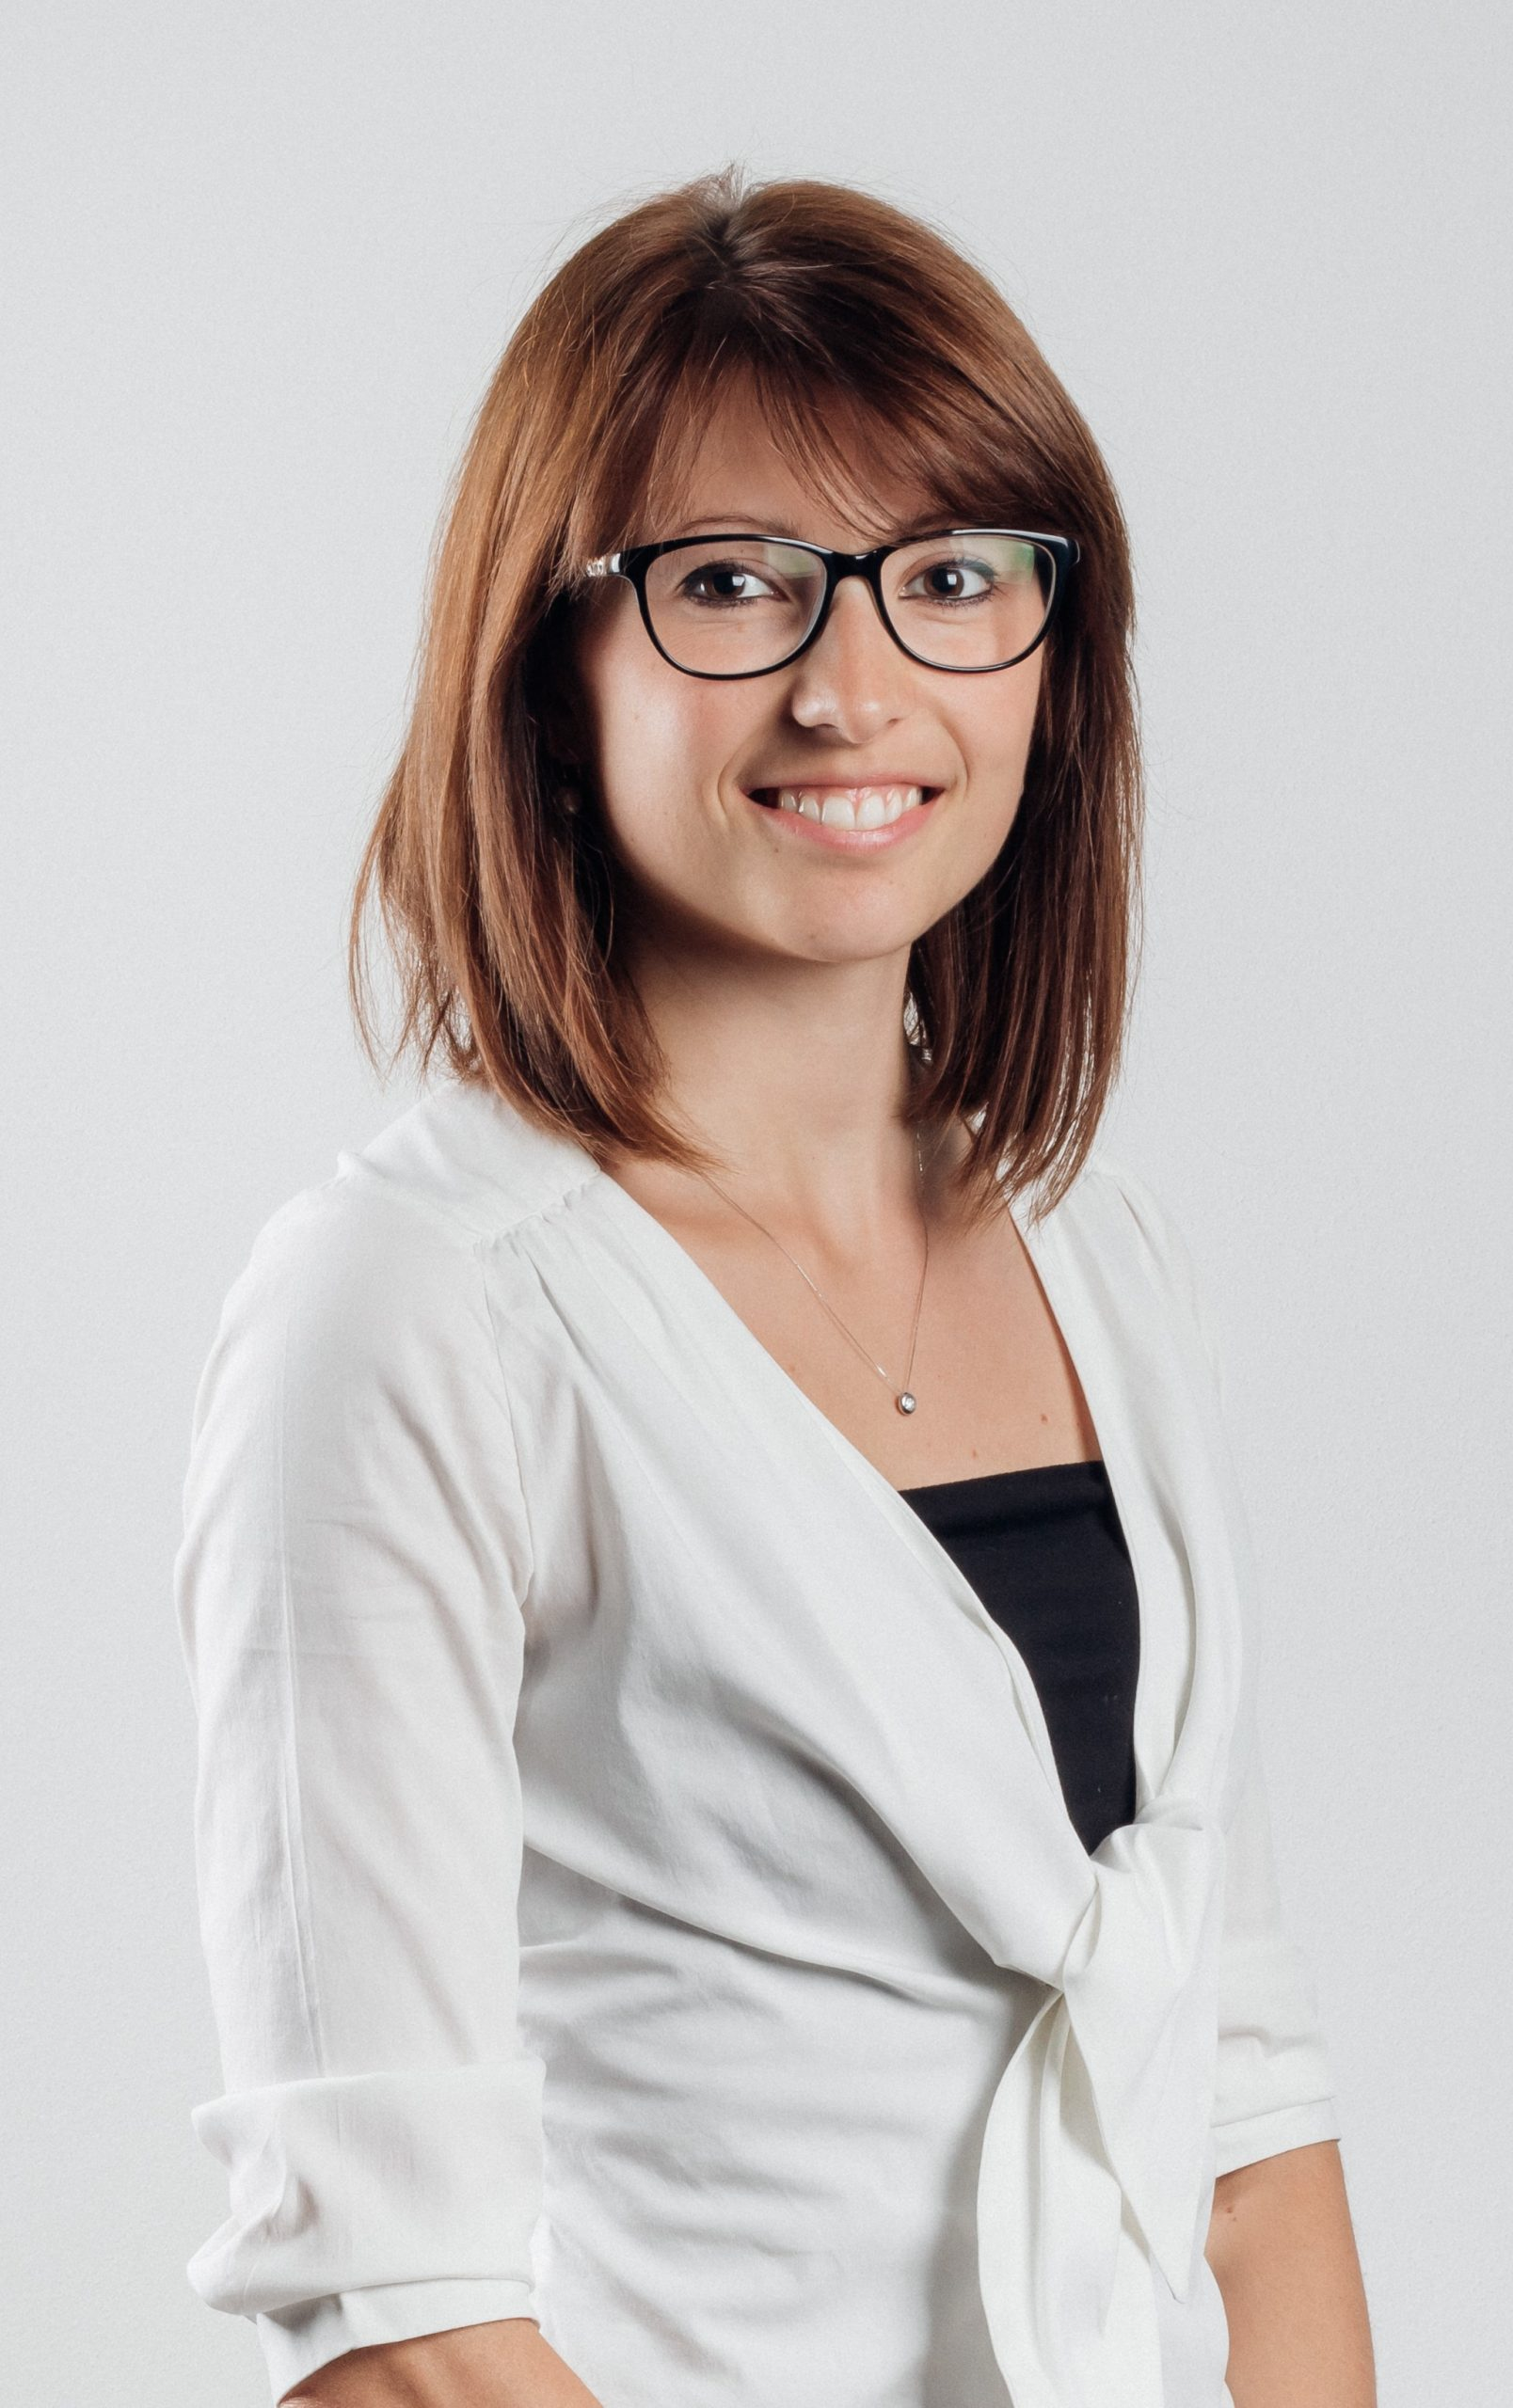 Elisabetta Fedrizzi